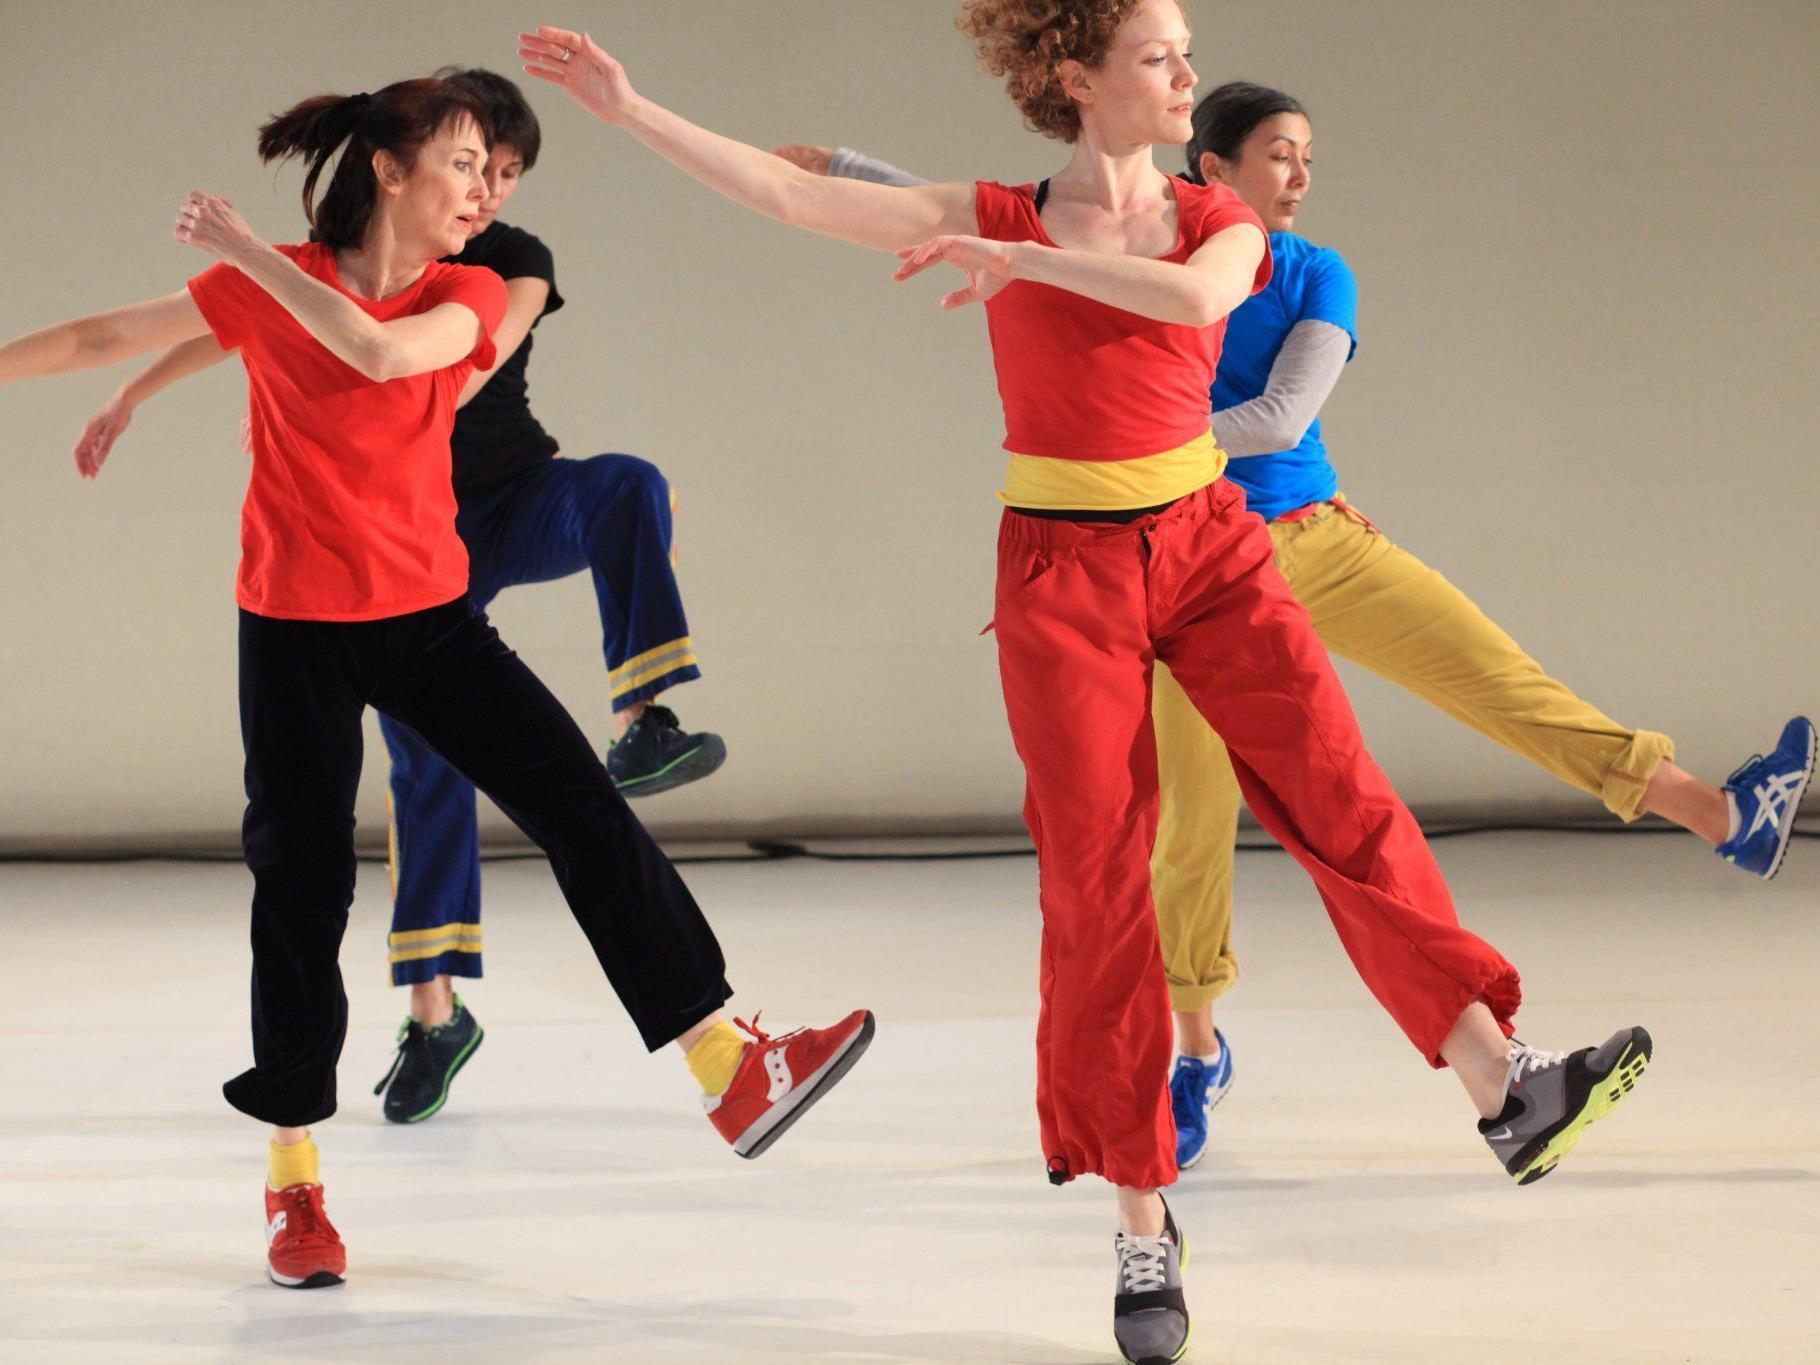 Tanz-Performance im Theater